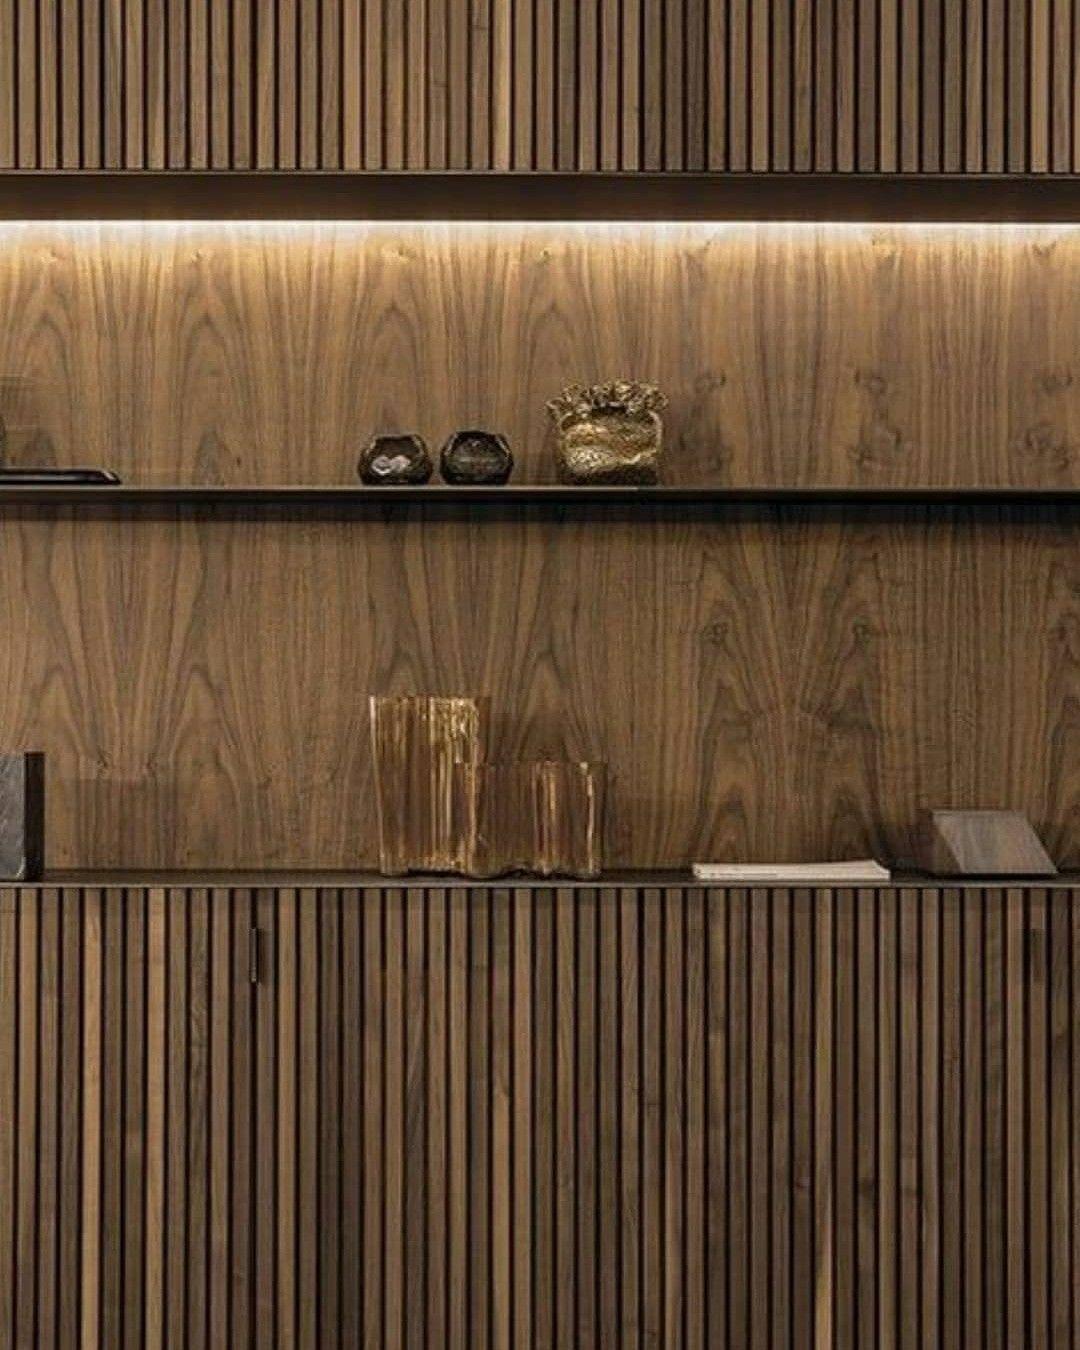 ديكورات خشب ديكور رفوف خشب يكور خشب للجدران لتواصل الرياض 0535711713 Classic Living Room Creative Home Home Decor